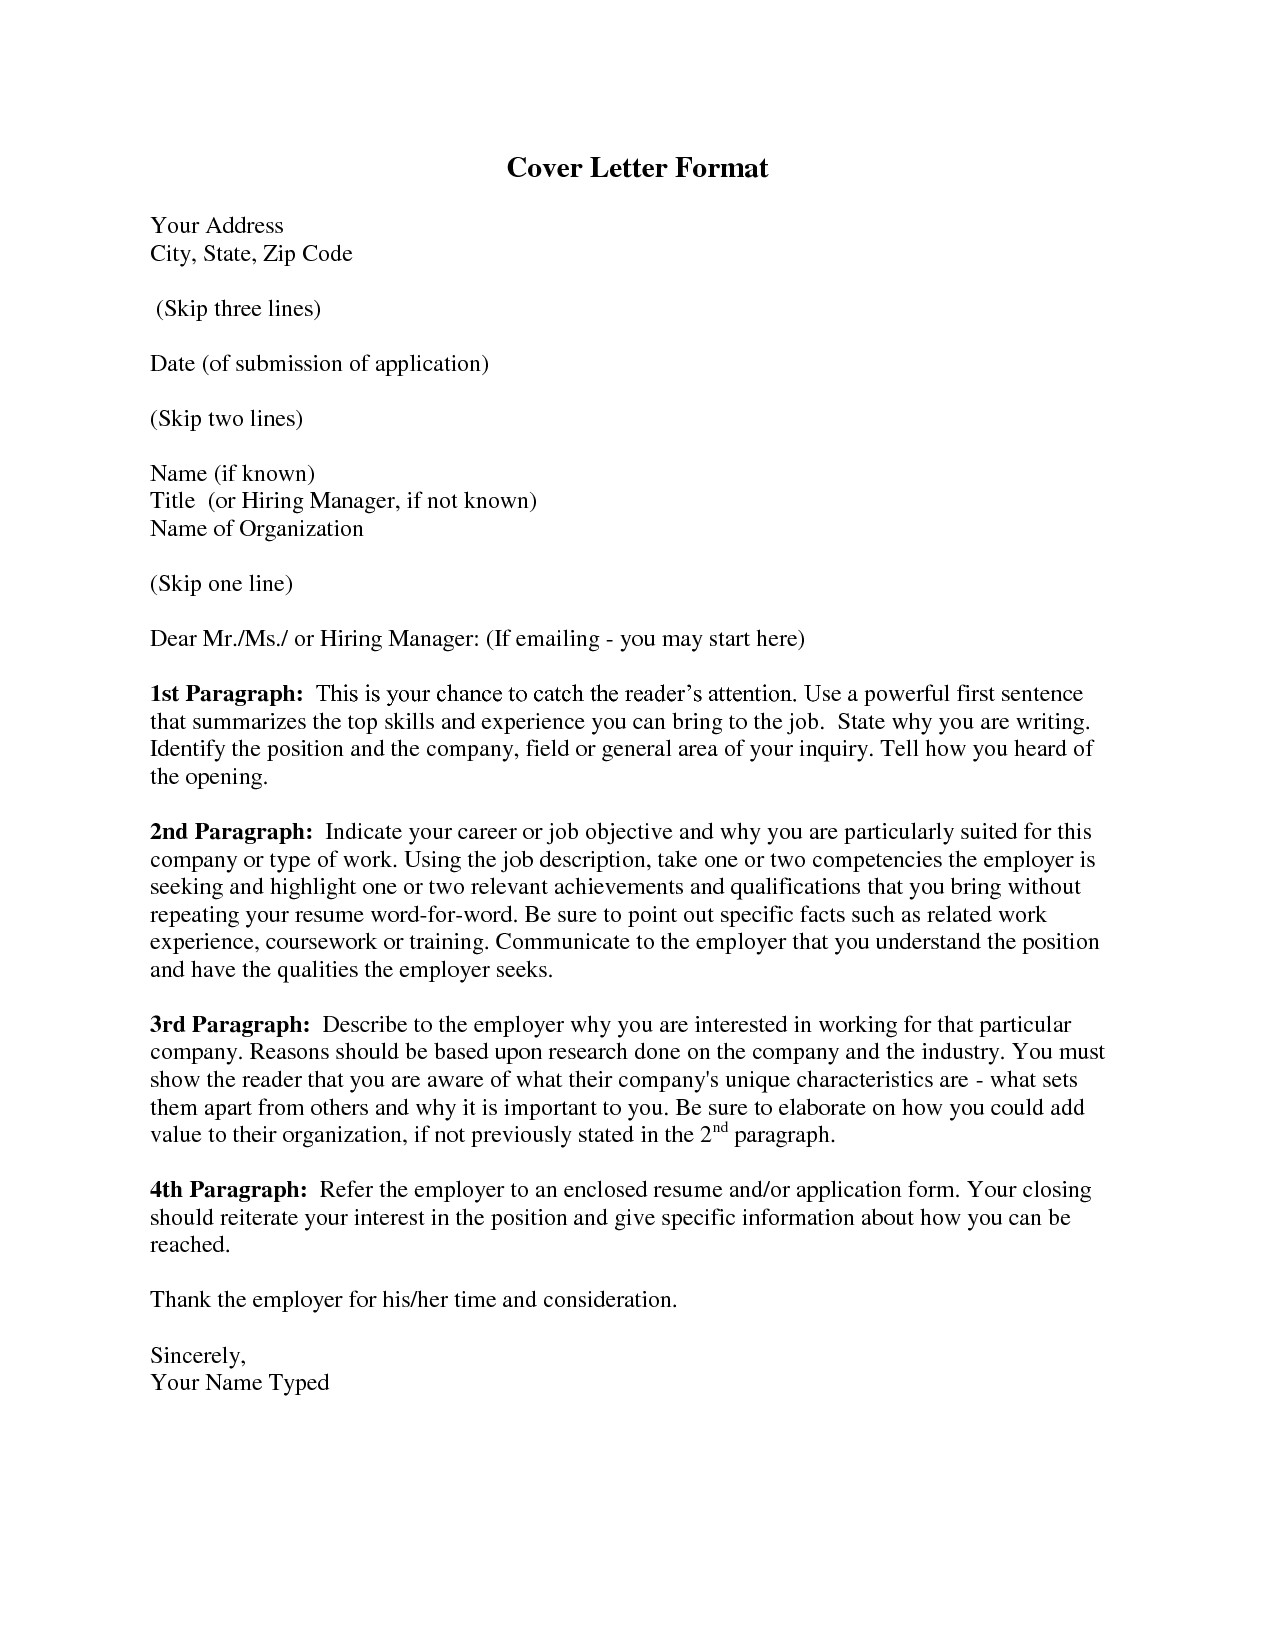 cover letter format 7575 respond